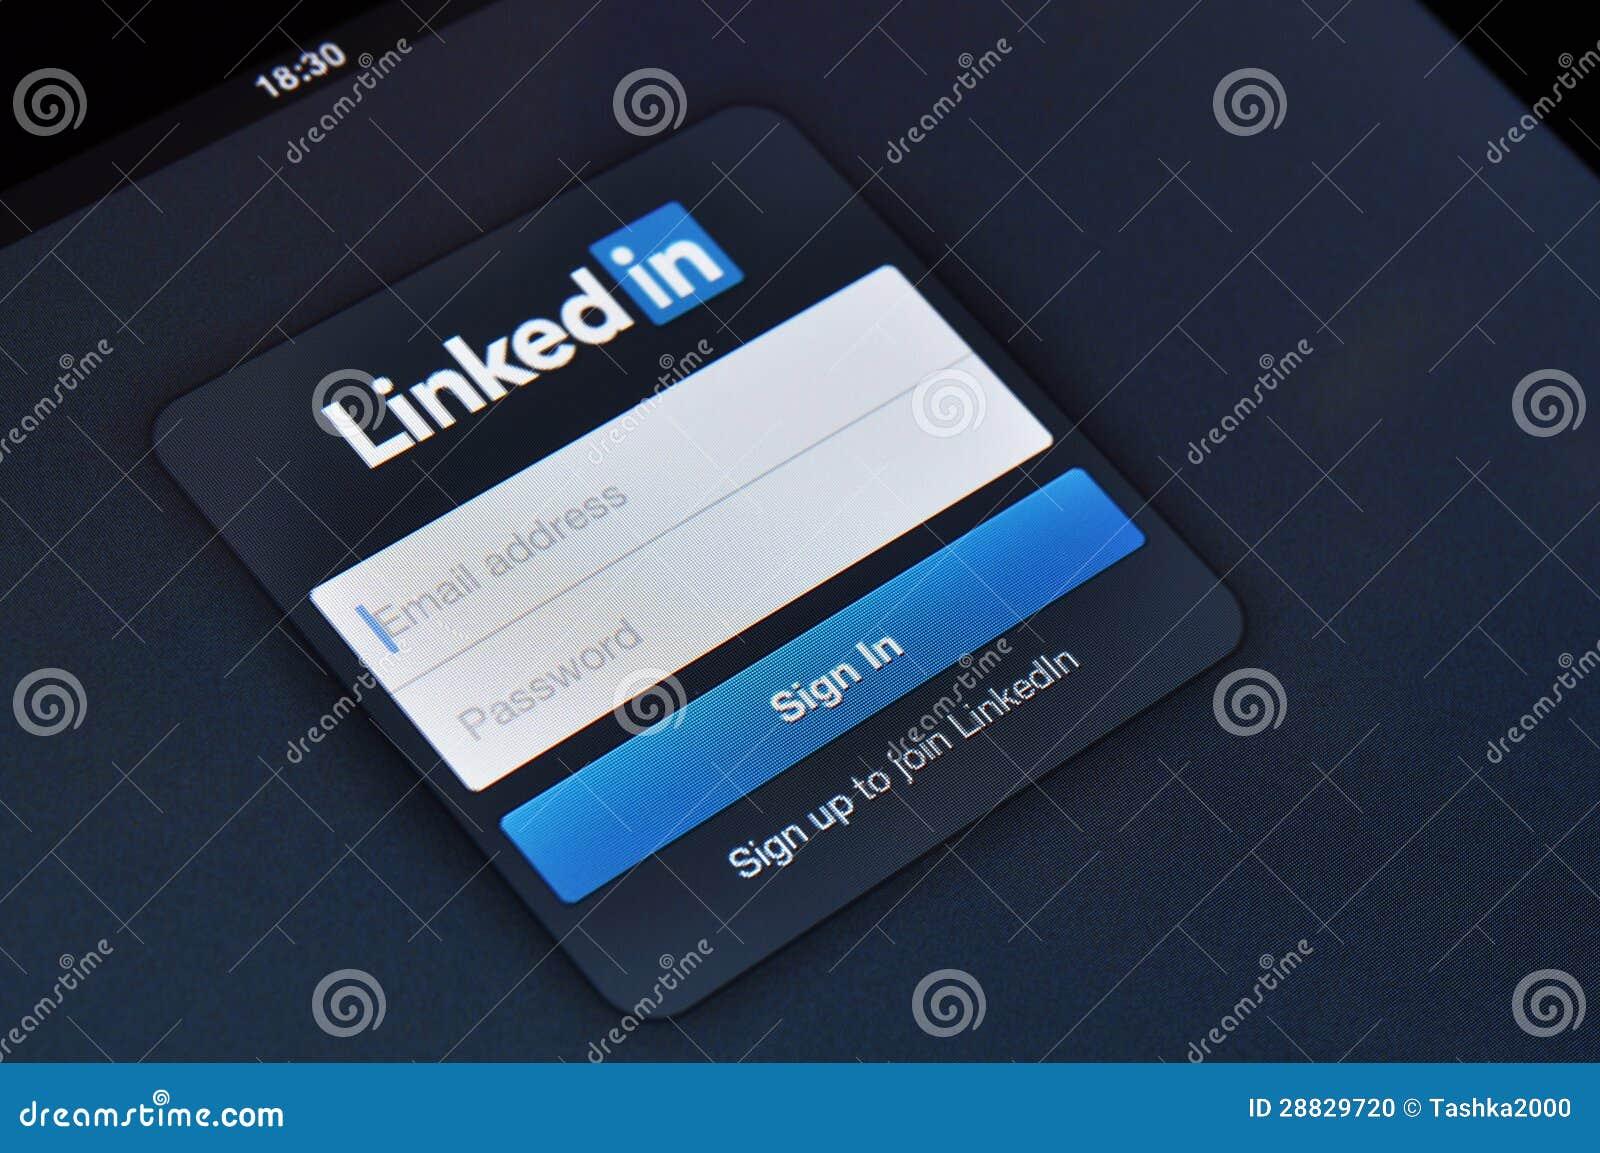 Linkedin Login Page On Apple IPad Screen Editorial Image - Image ...